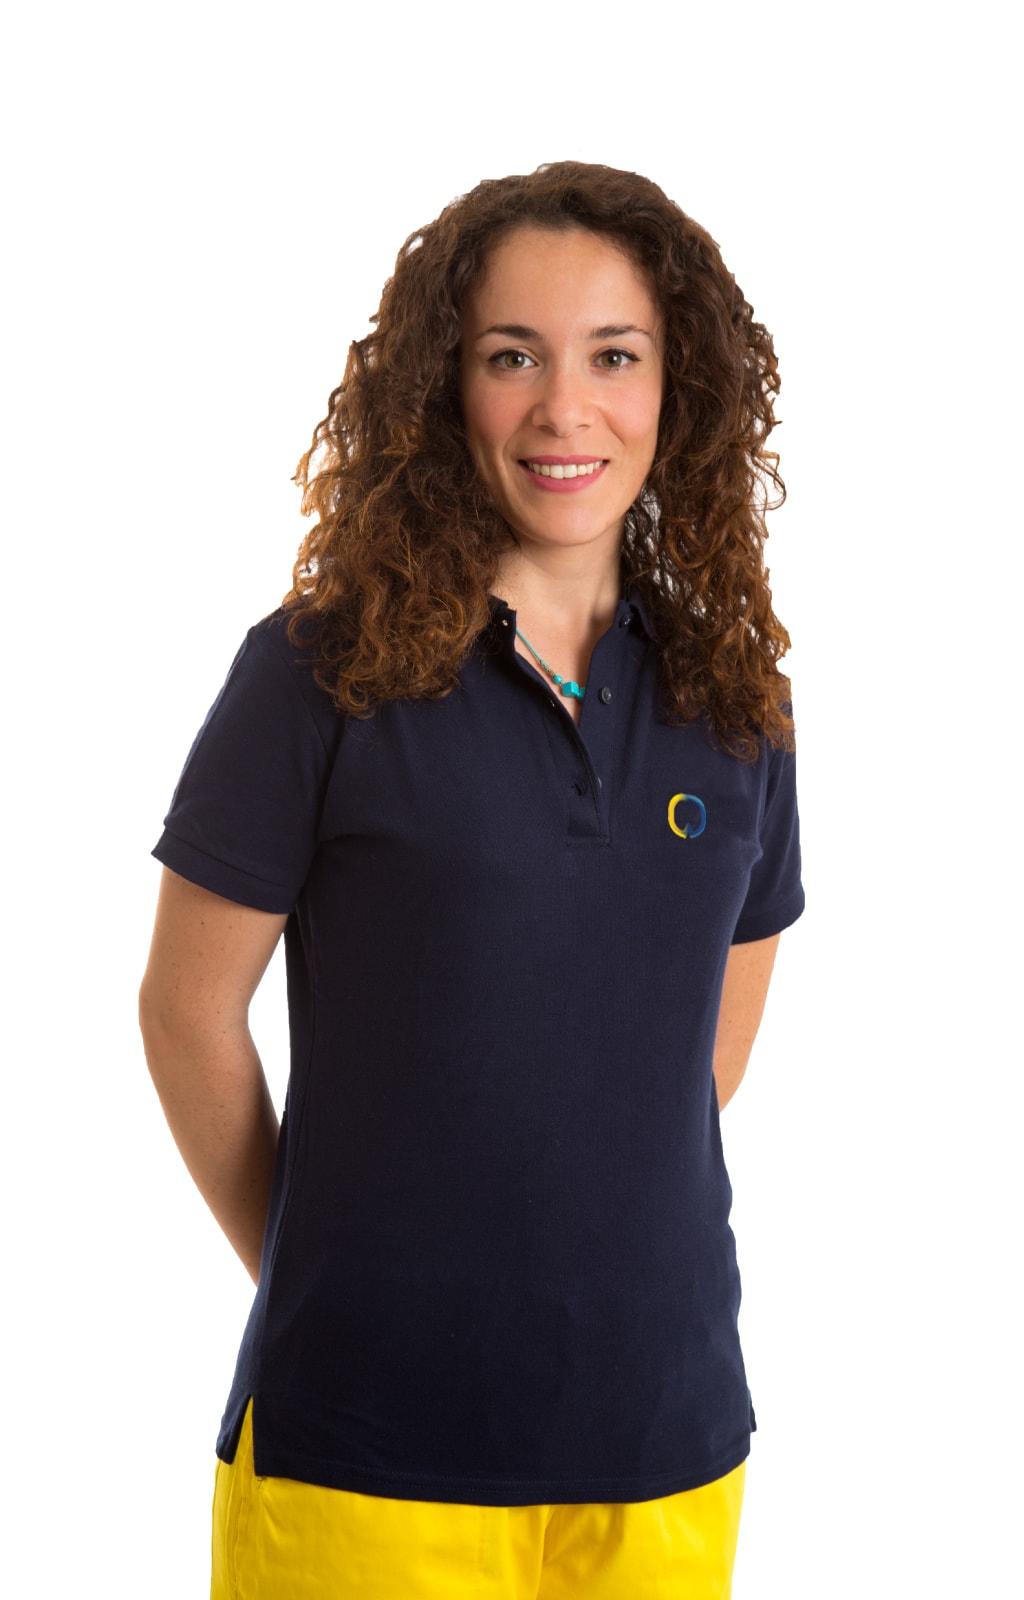 Dott.ssa Valentina Dipaola